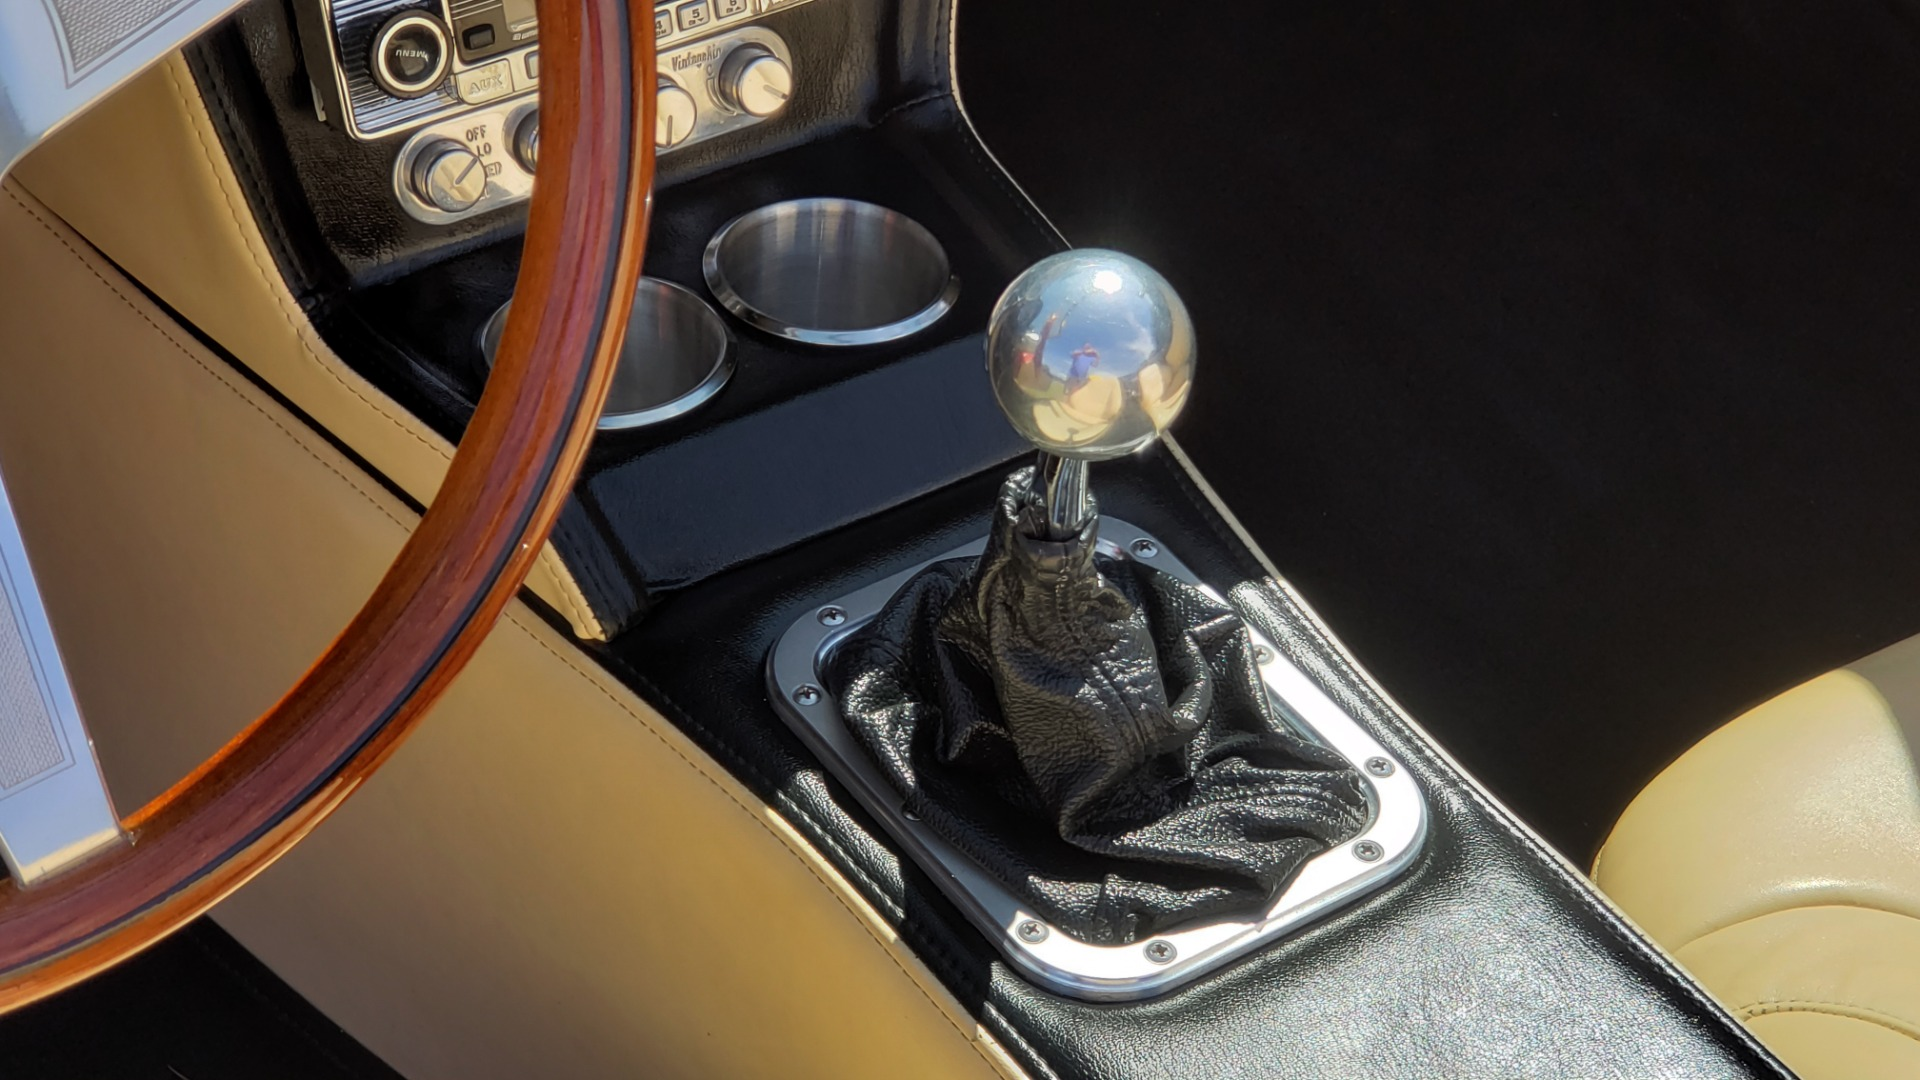 Used 1961 Ferrari 250GT SWB CALIFORNIA REPLICA / 302CI V8 / TREMEC 5-SPEED for sale Sold at Formula Imports in Charlotte NC 28227 47